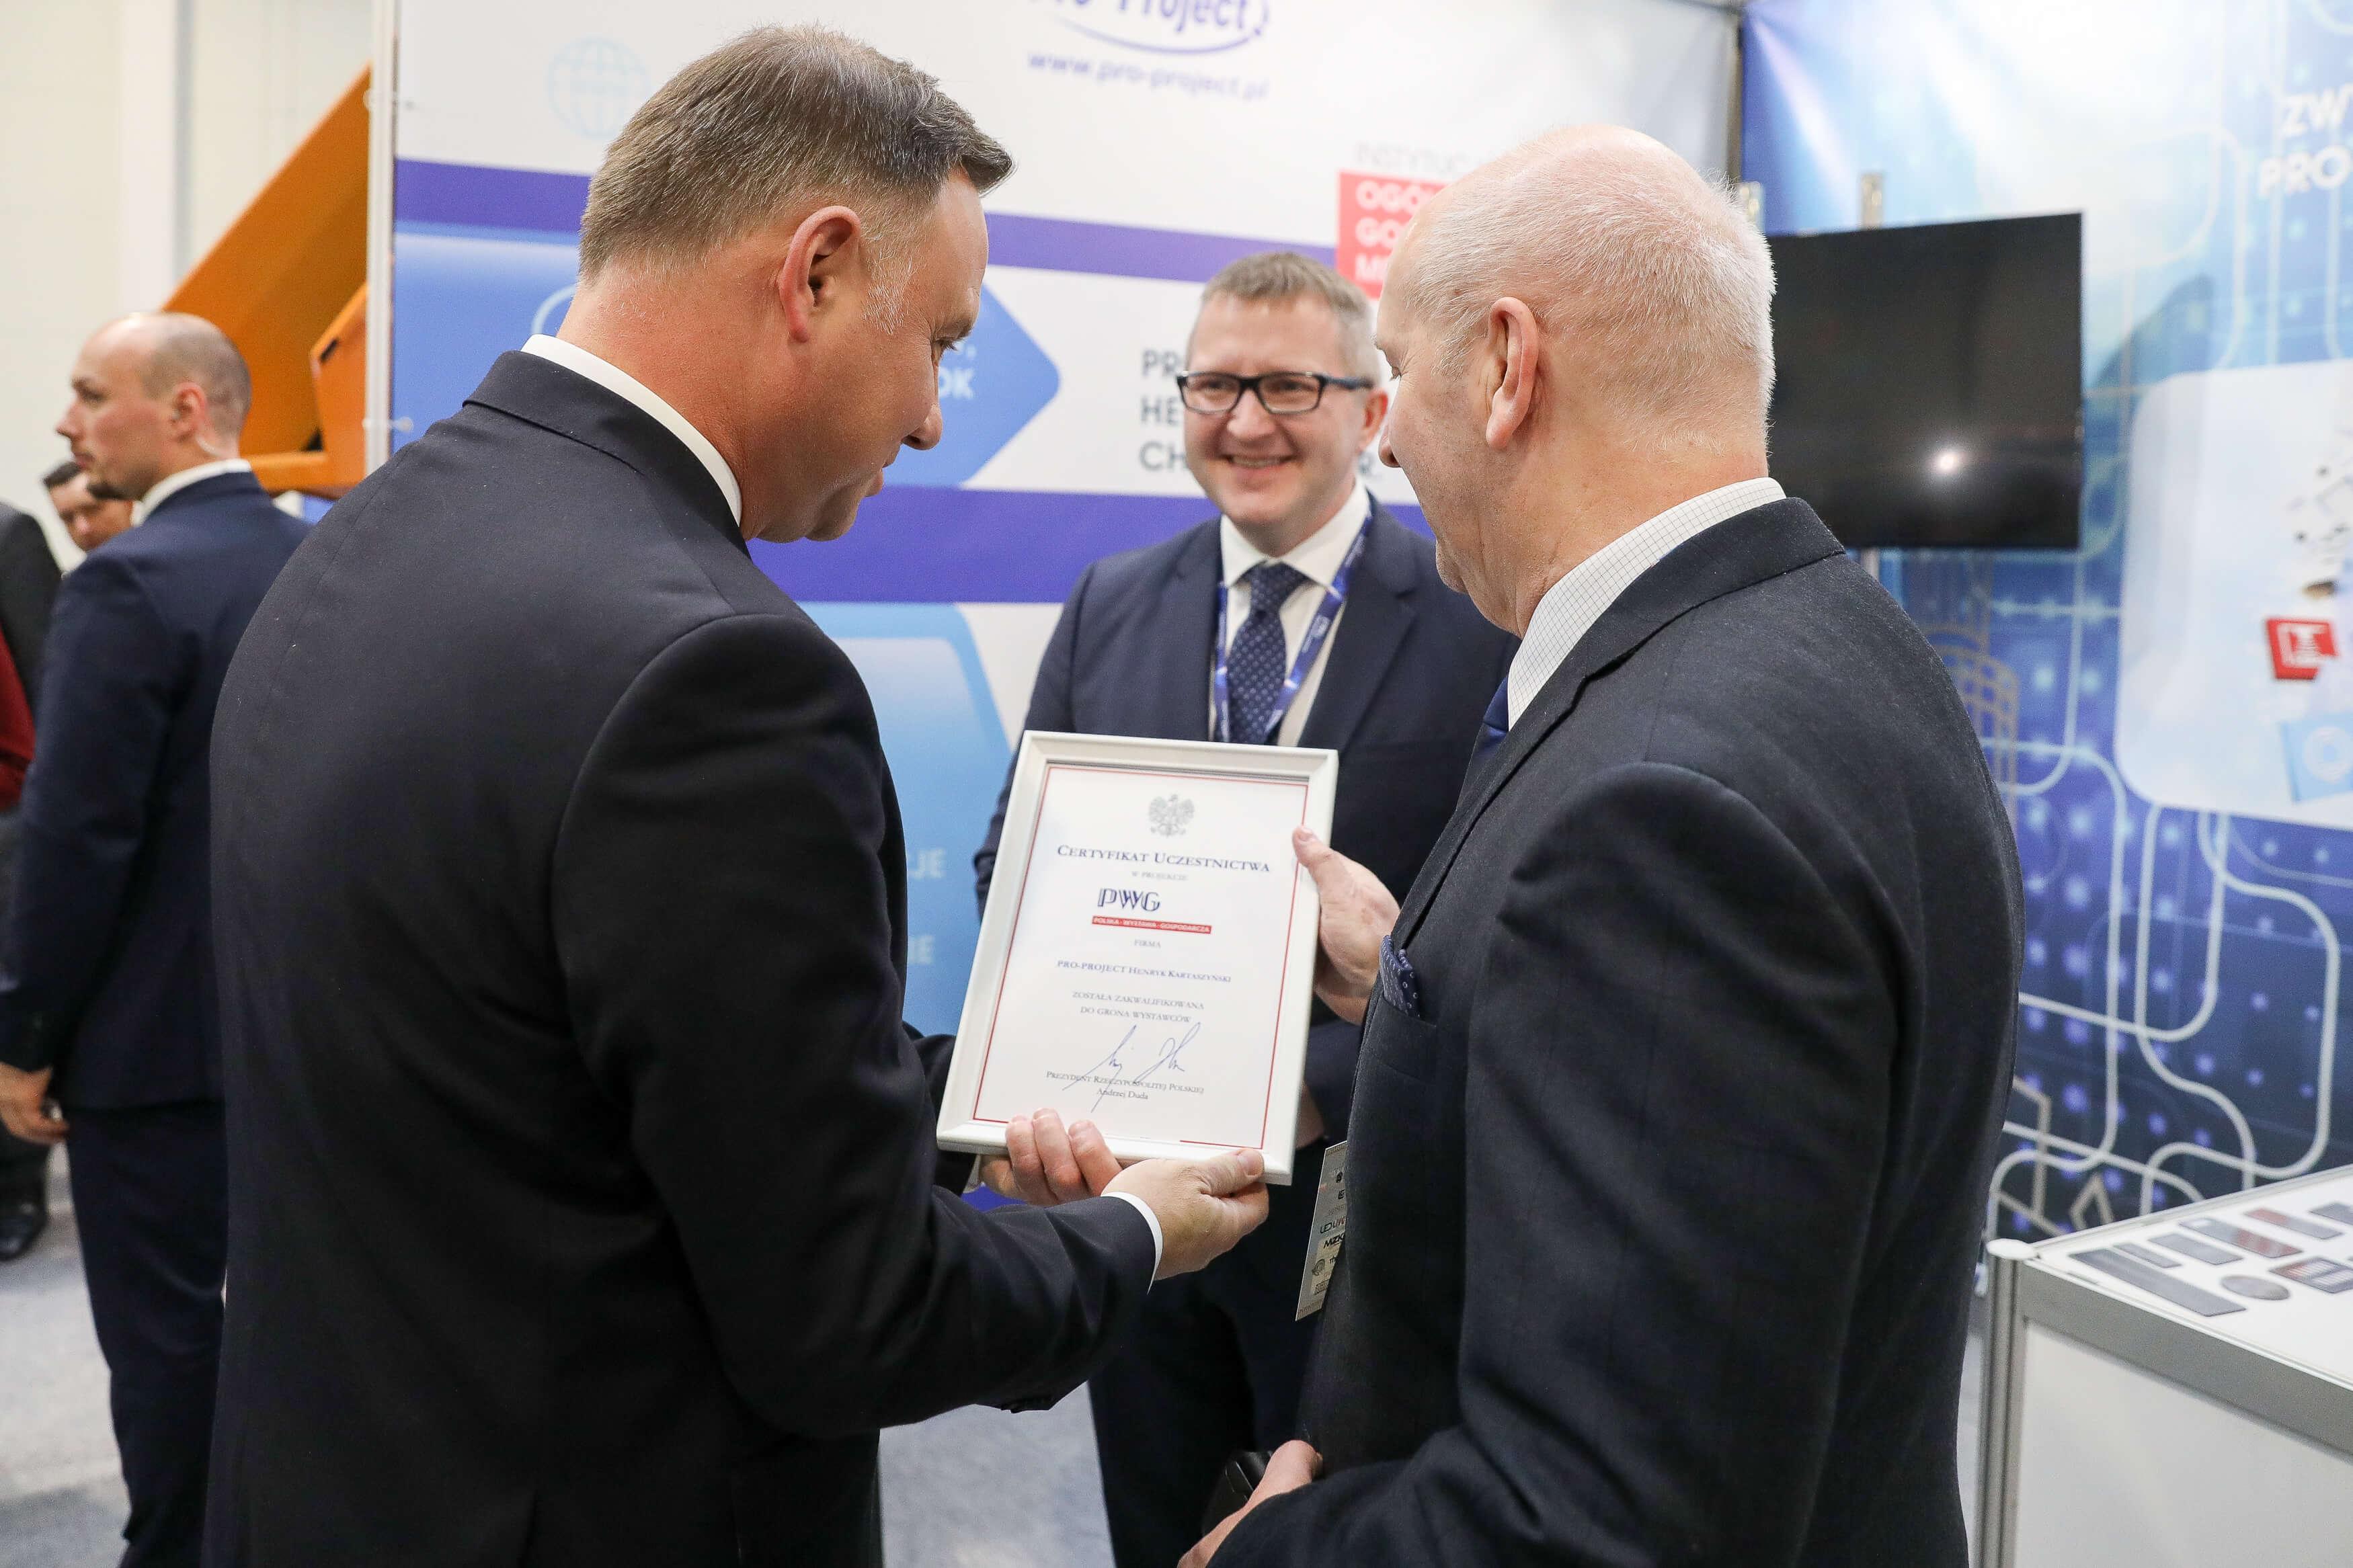 Polish president is handing the certiicate to Henryk Kartaszyński.